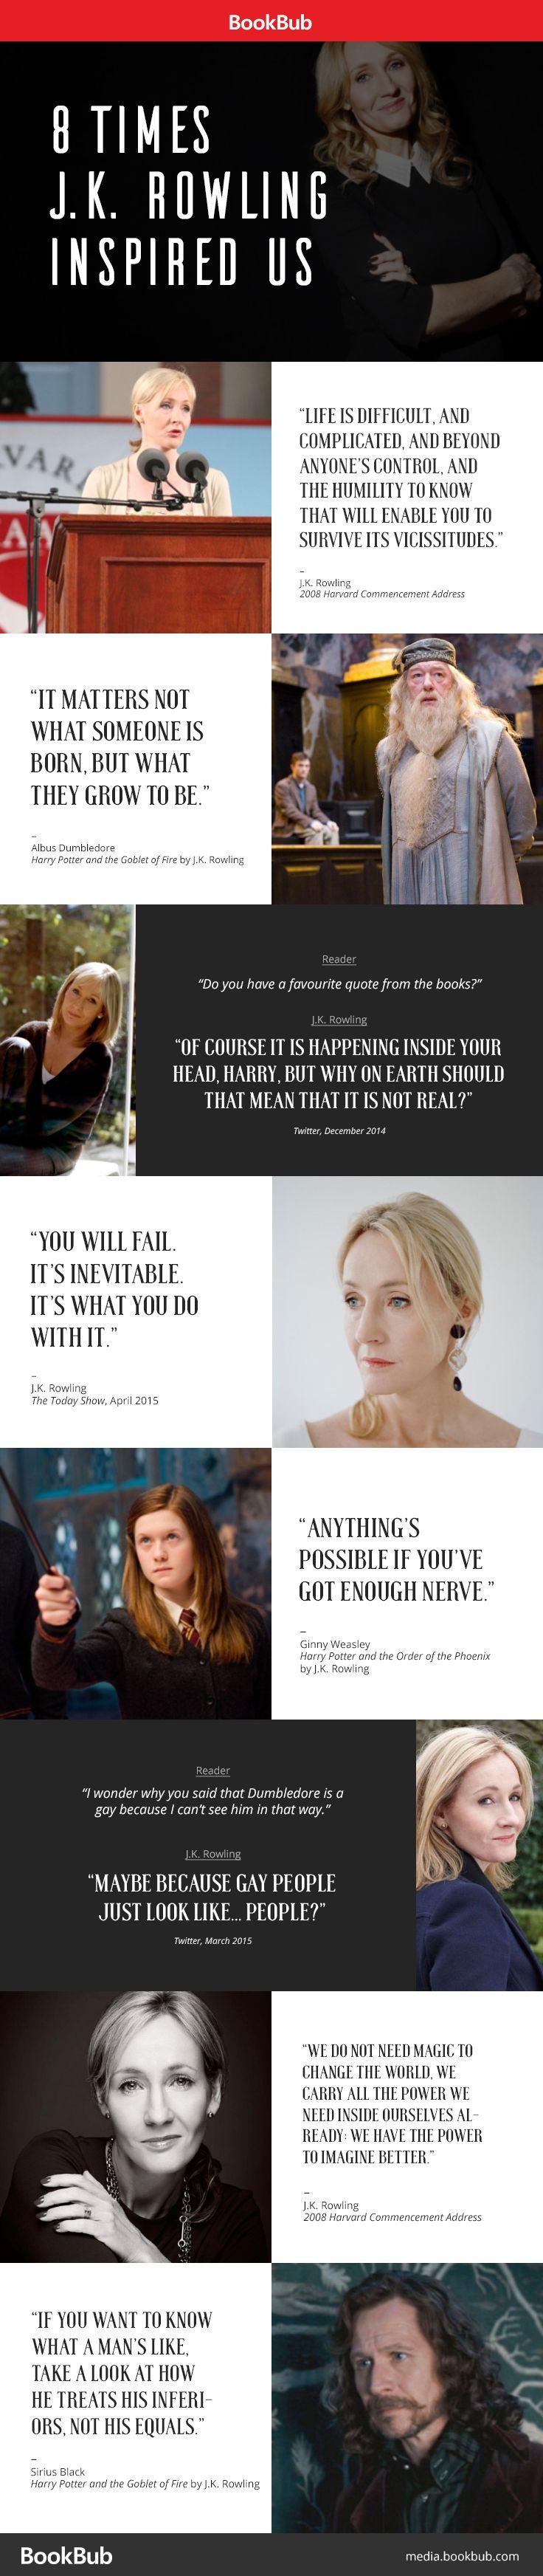 We love J.K. Rowling!